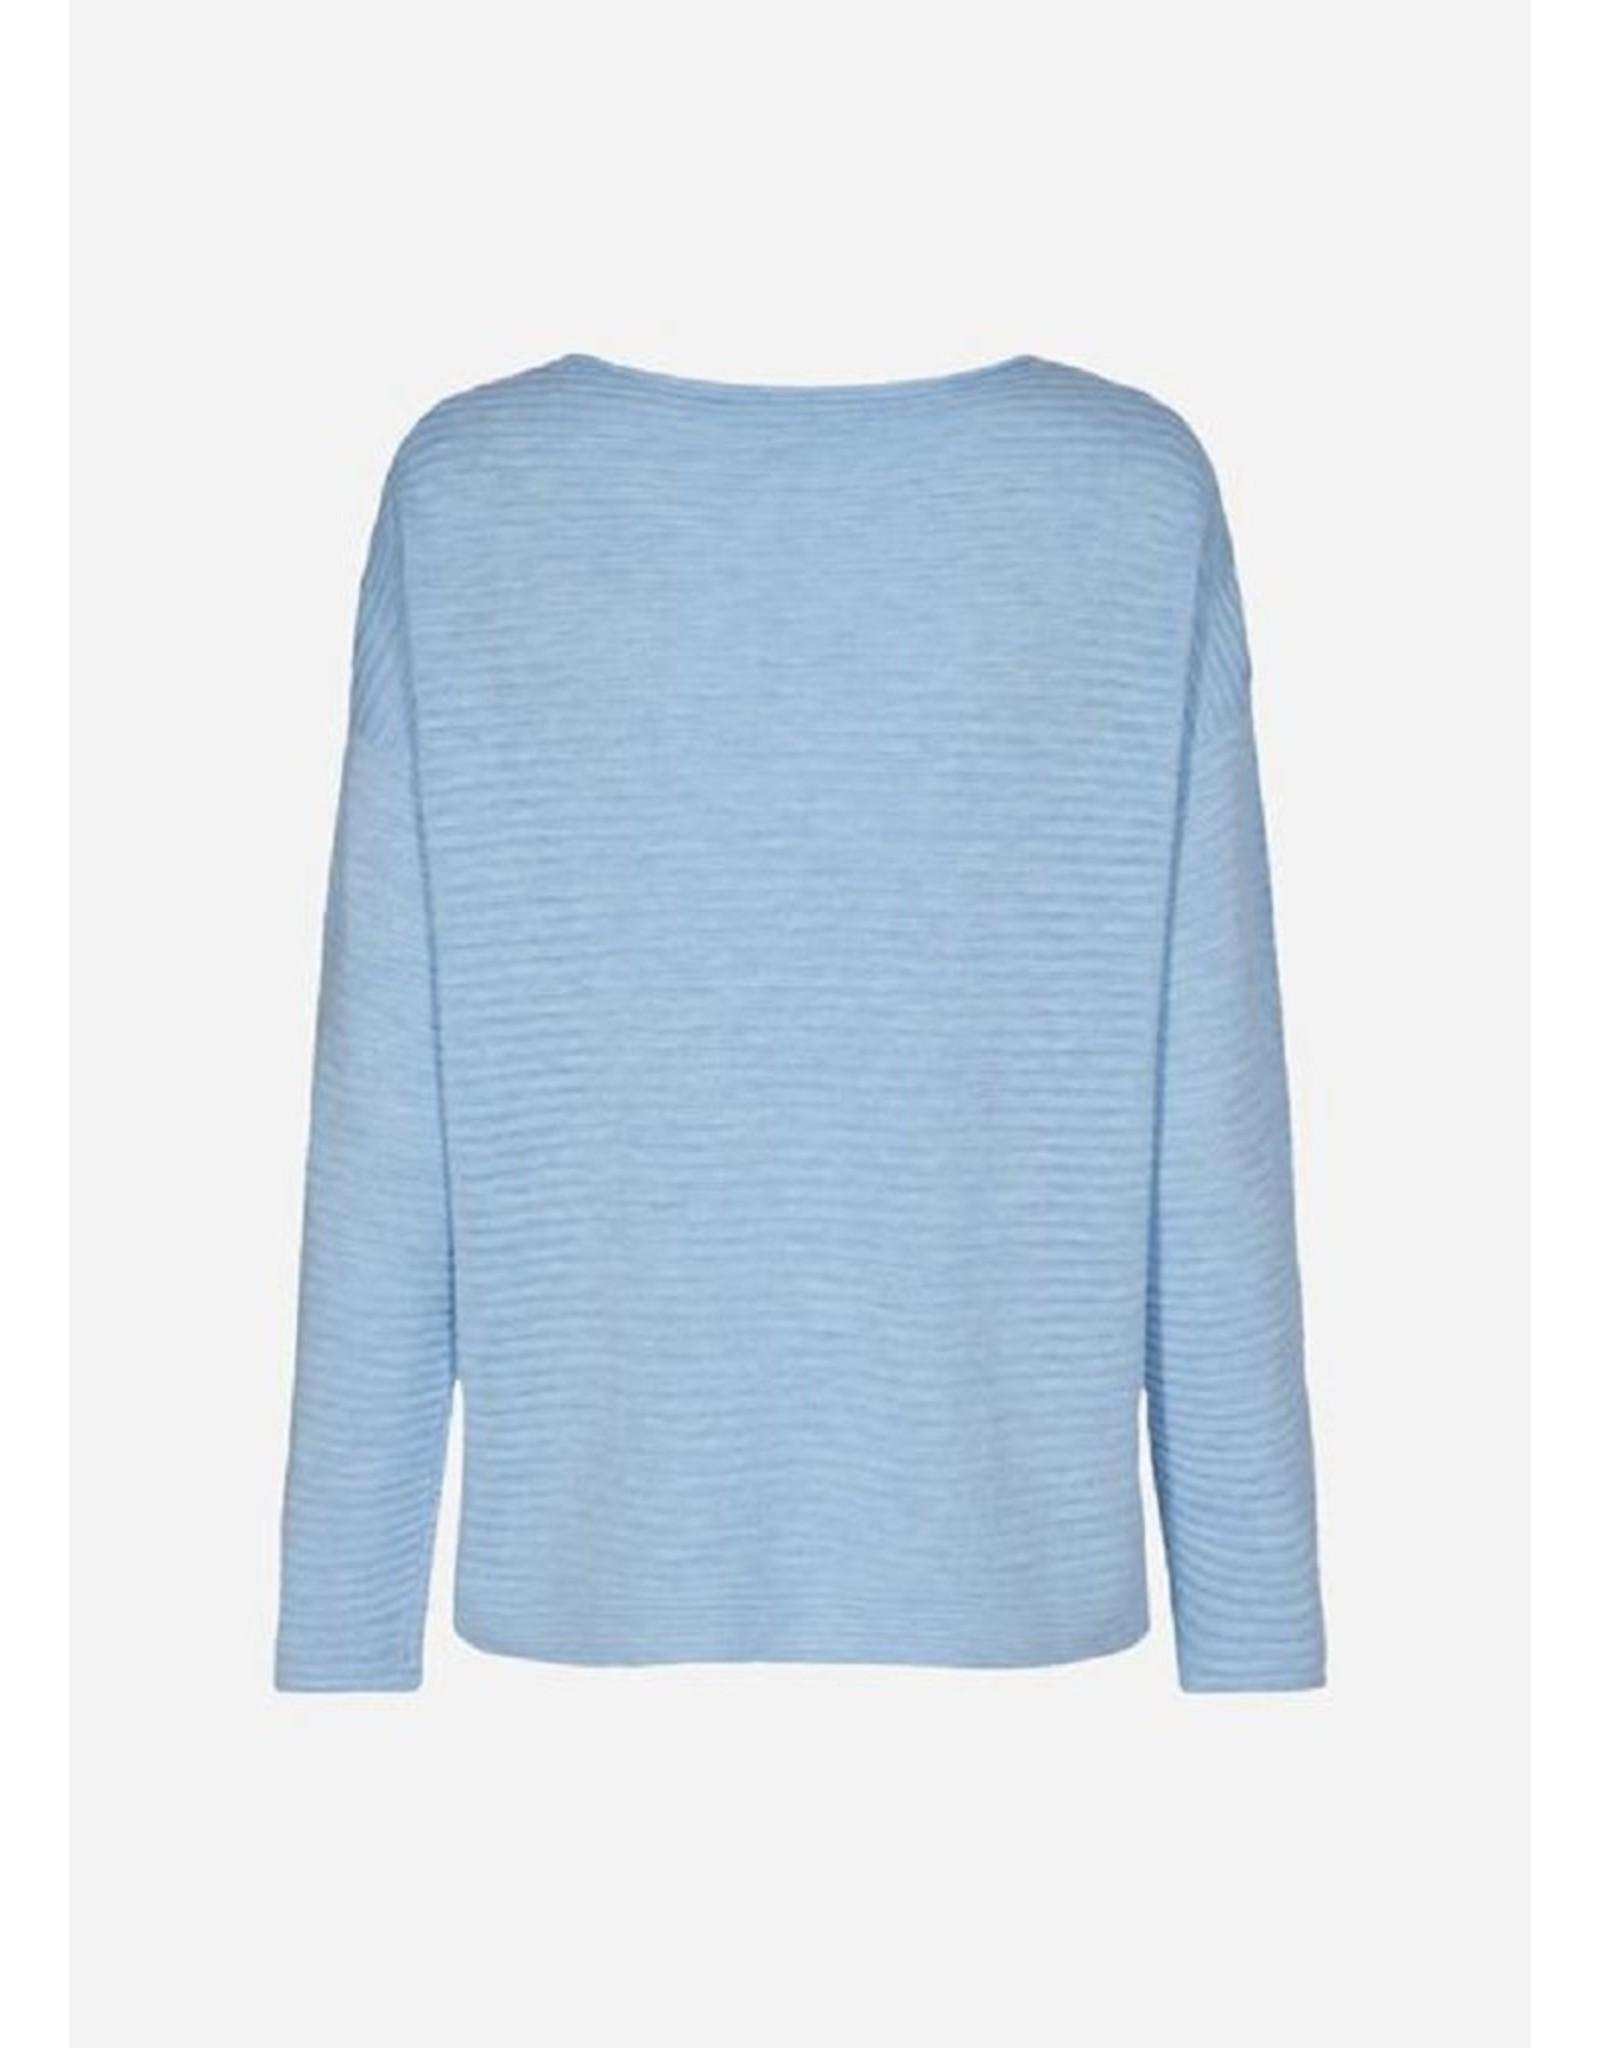 Soyaconcept Soyaconcept Niaka pullover Powder blue